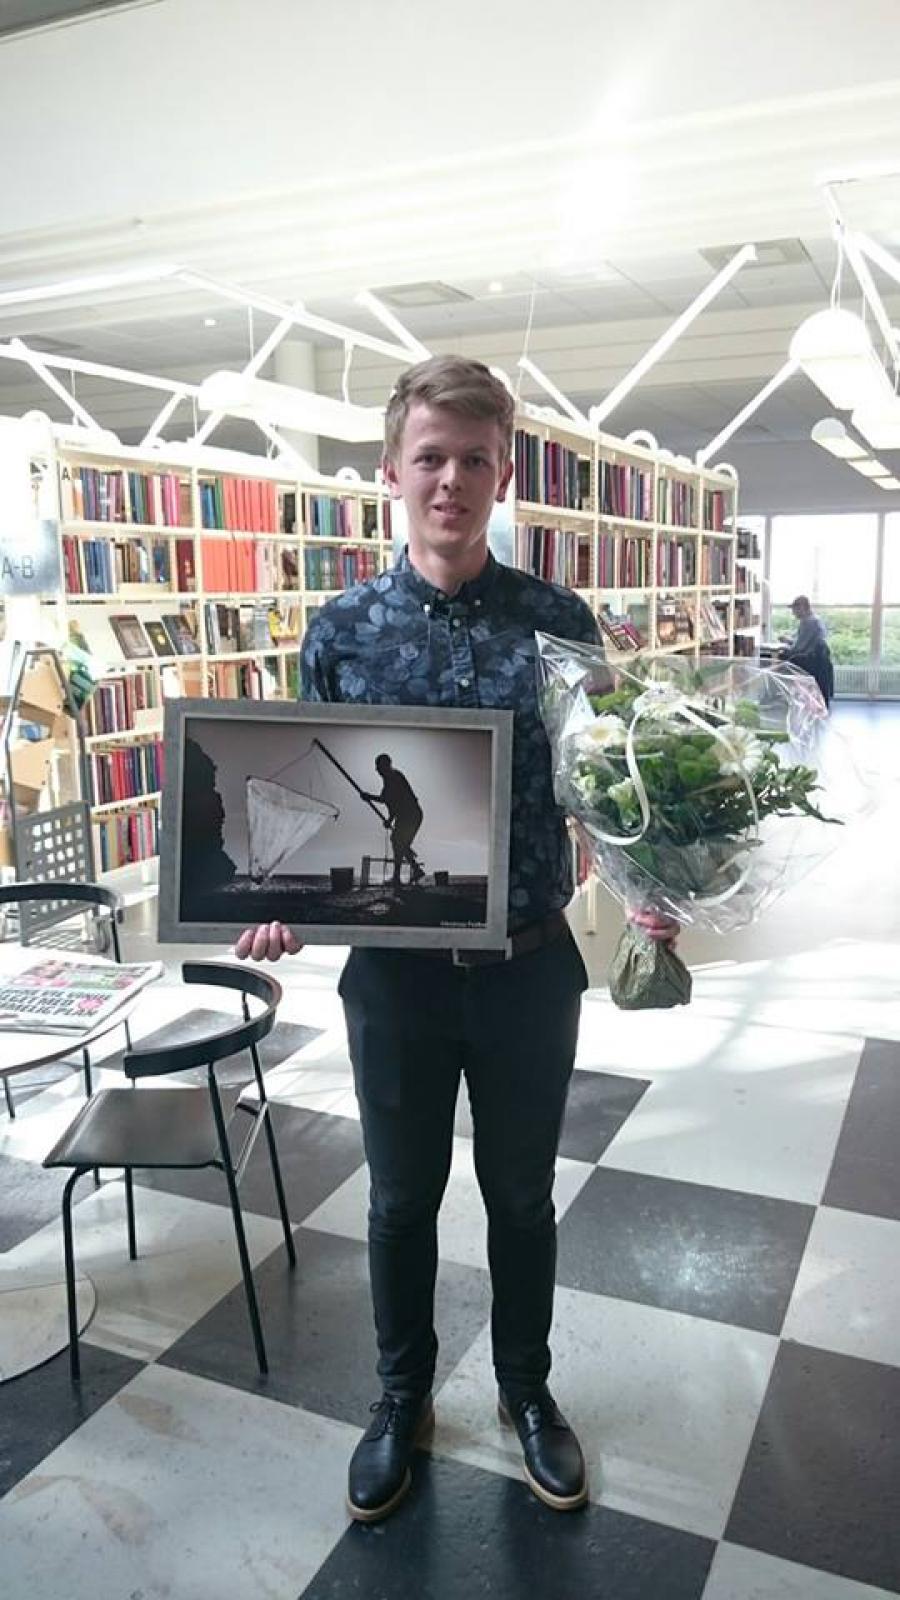 Danmarks Unge Fototalent